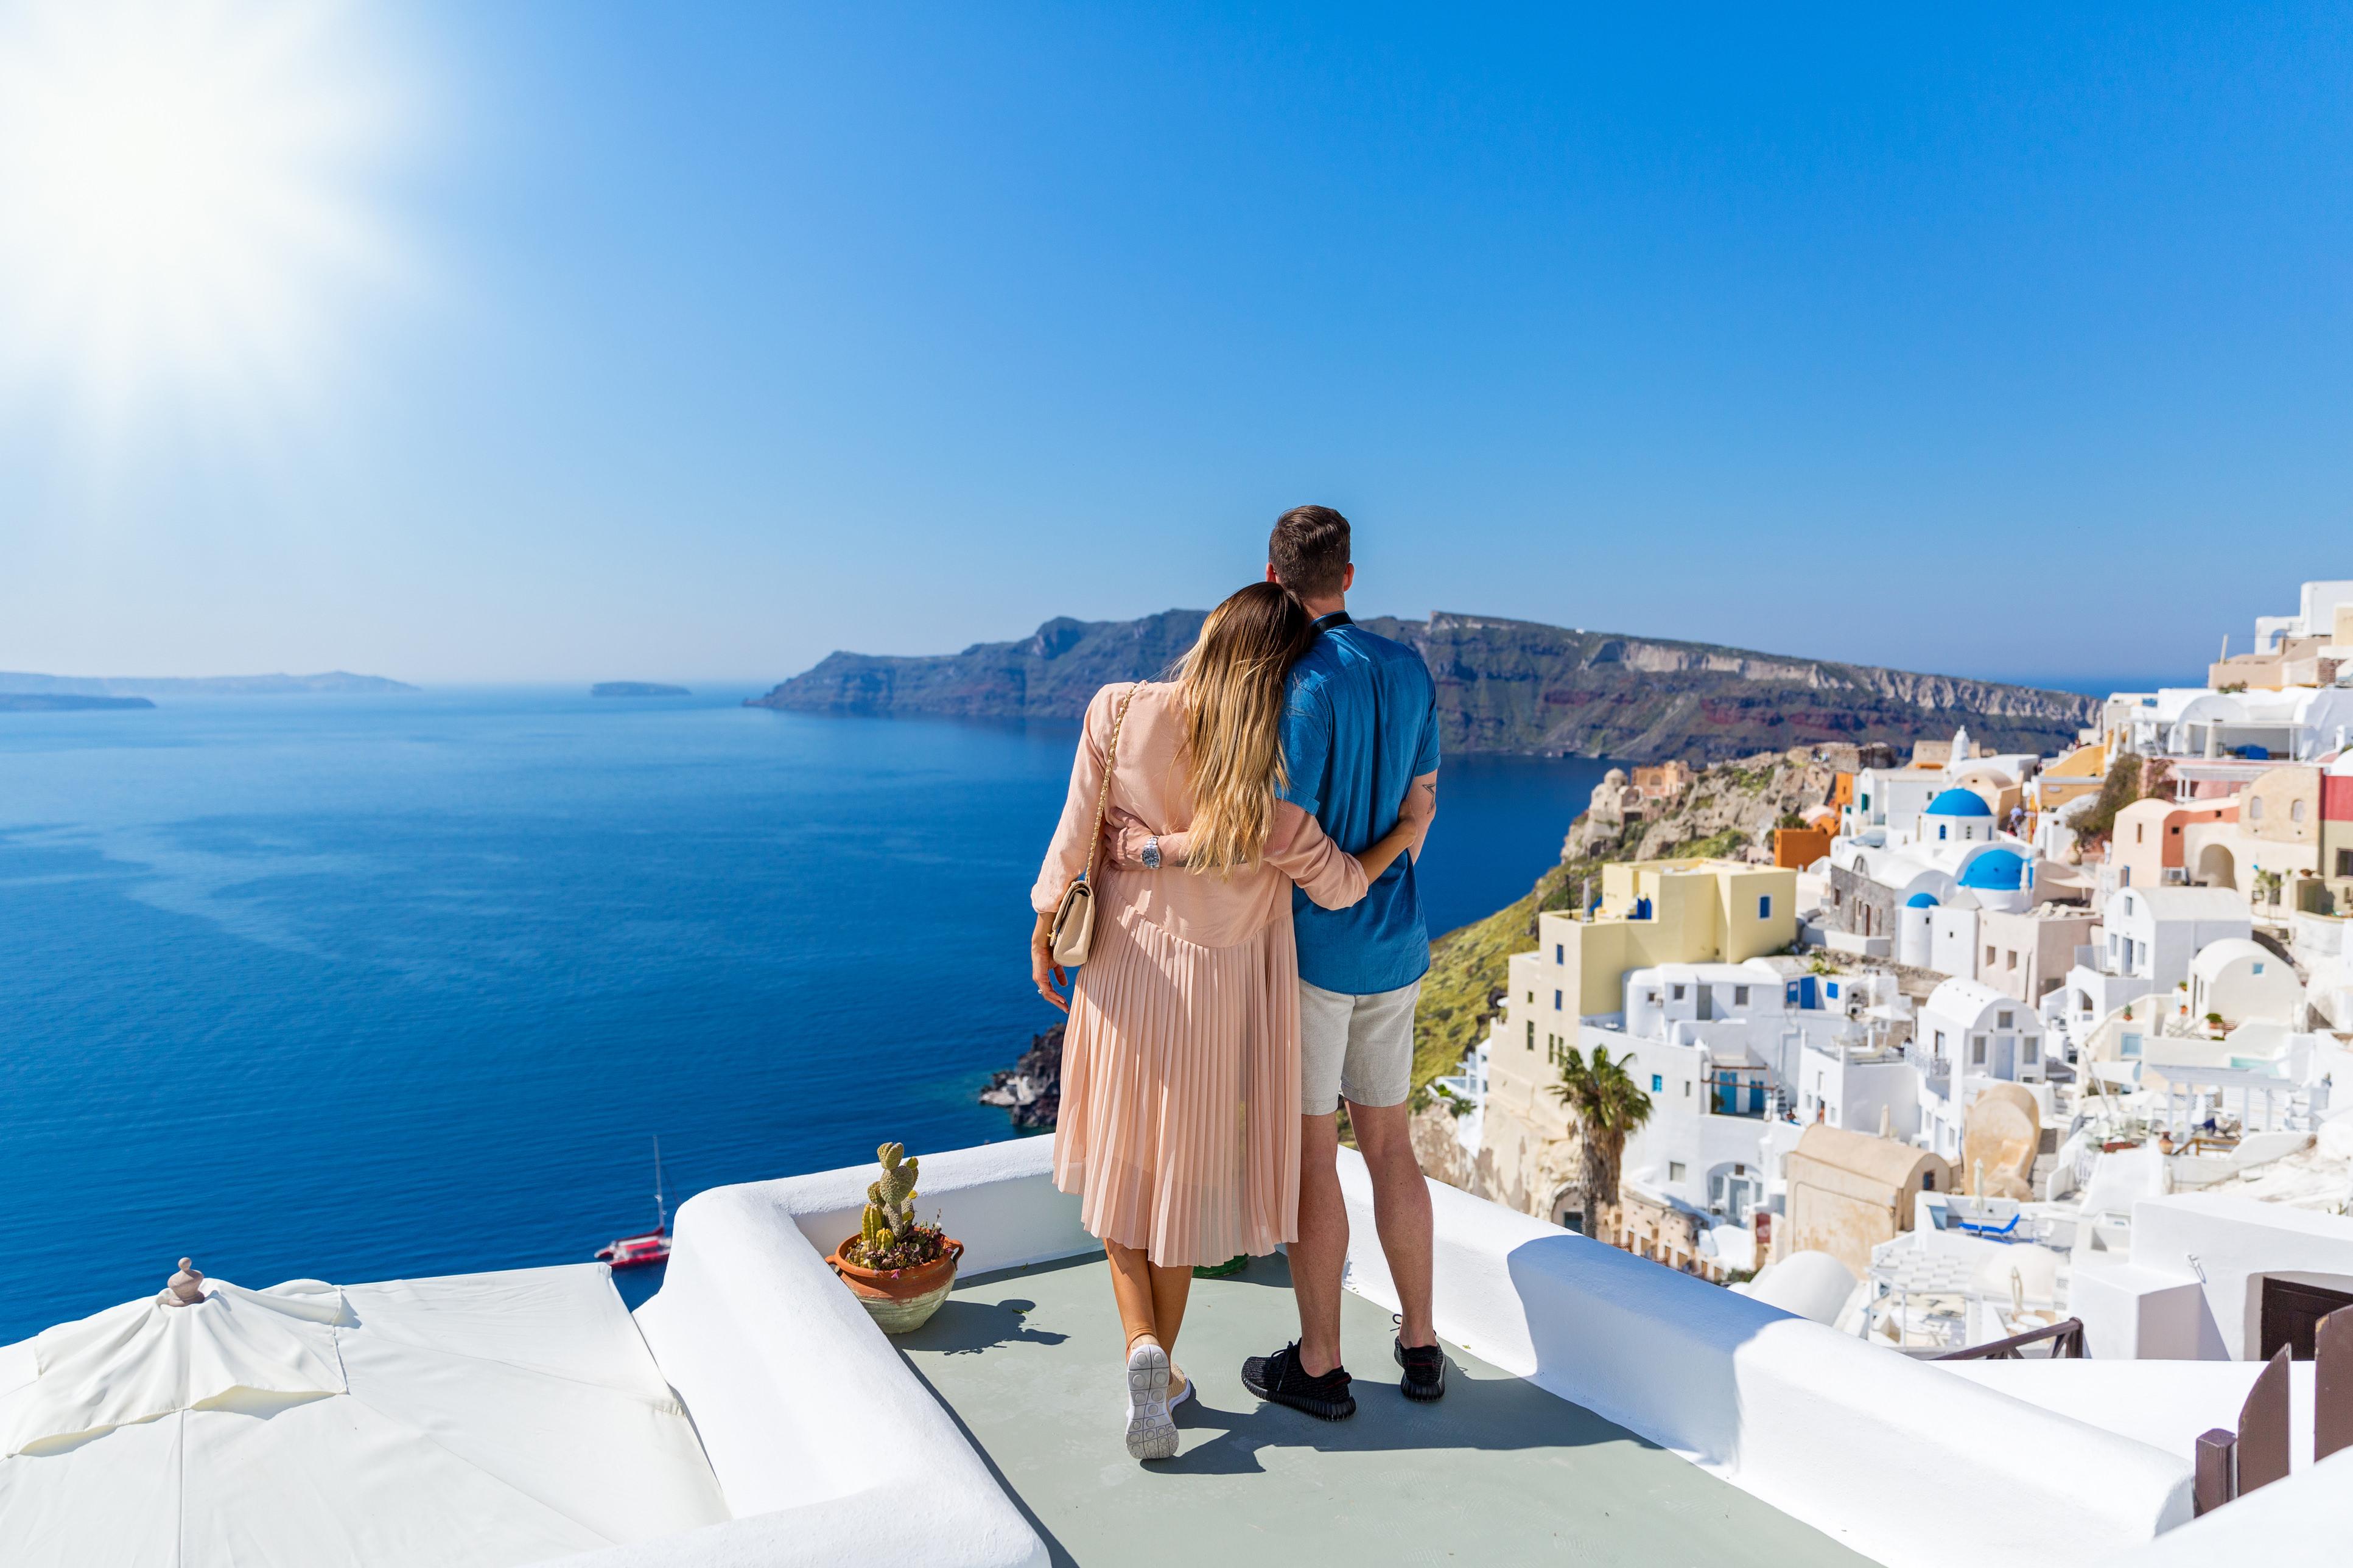 Where To Watch A Romantic Sunset On Santorini